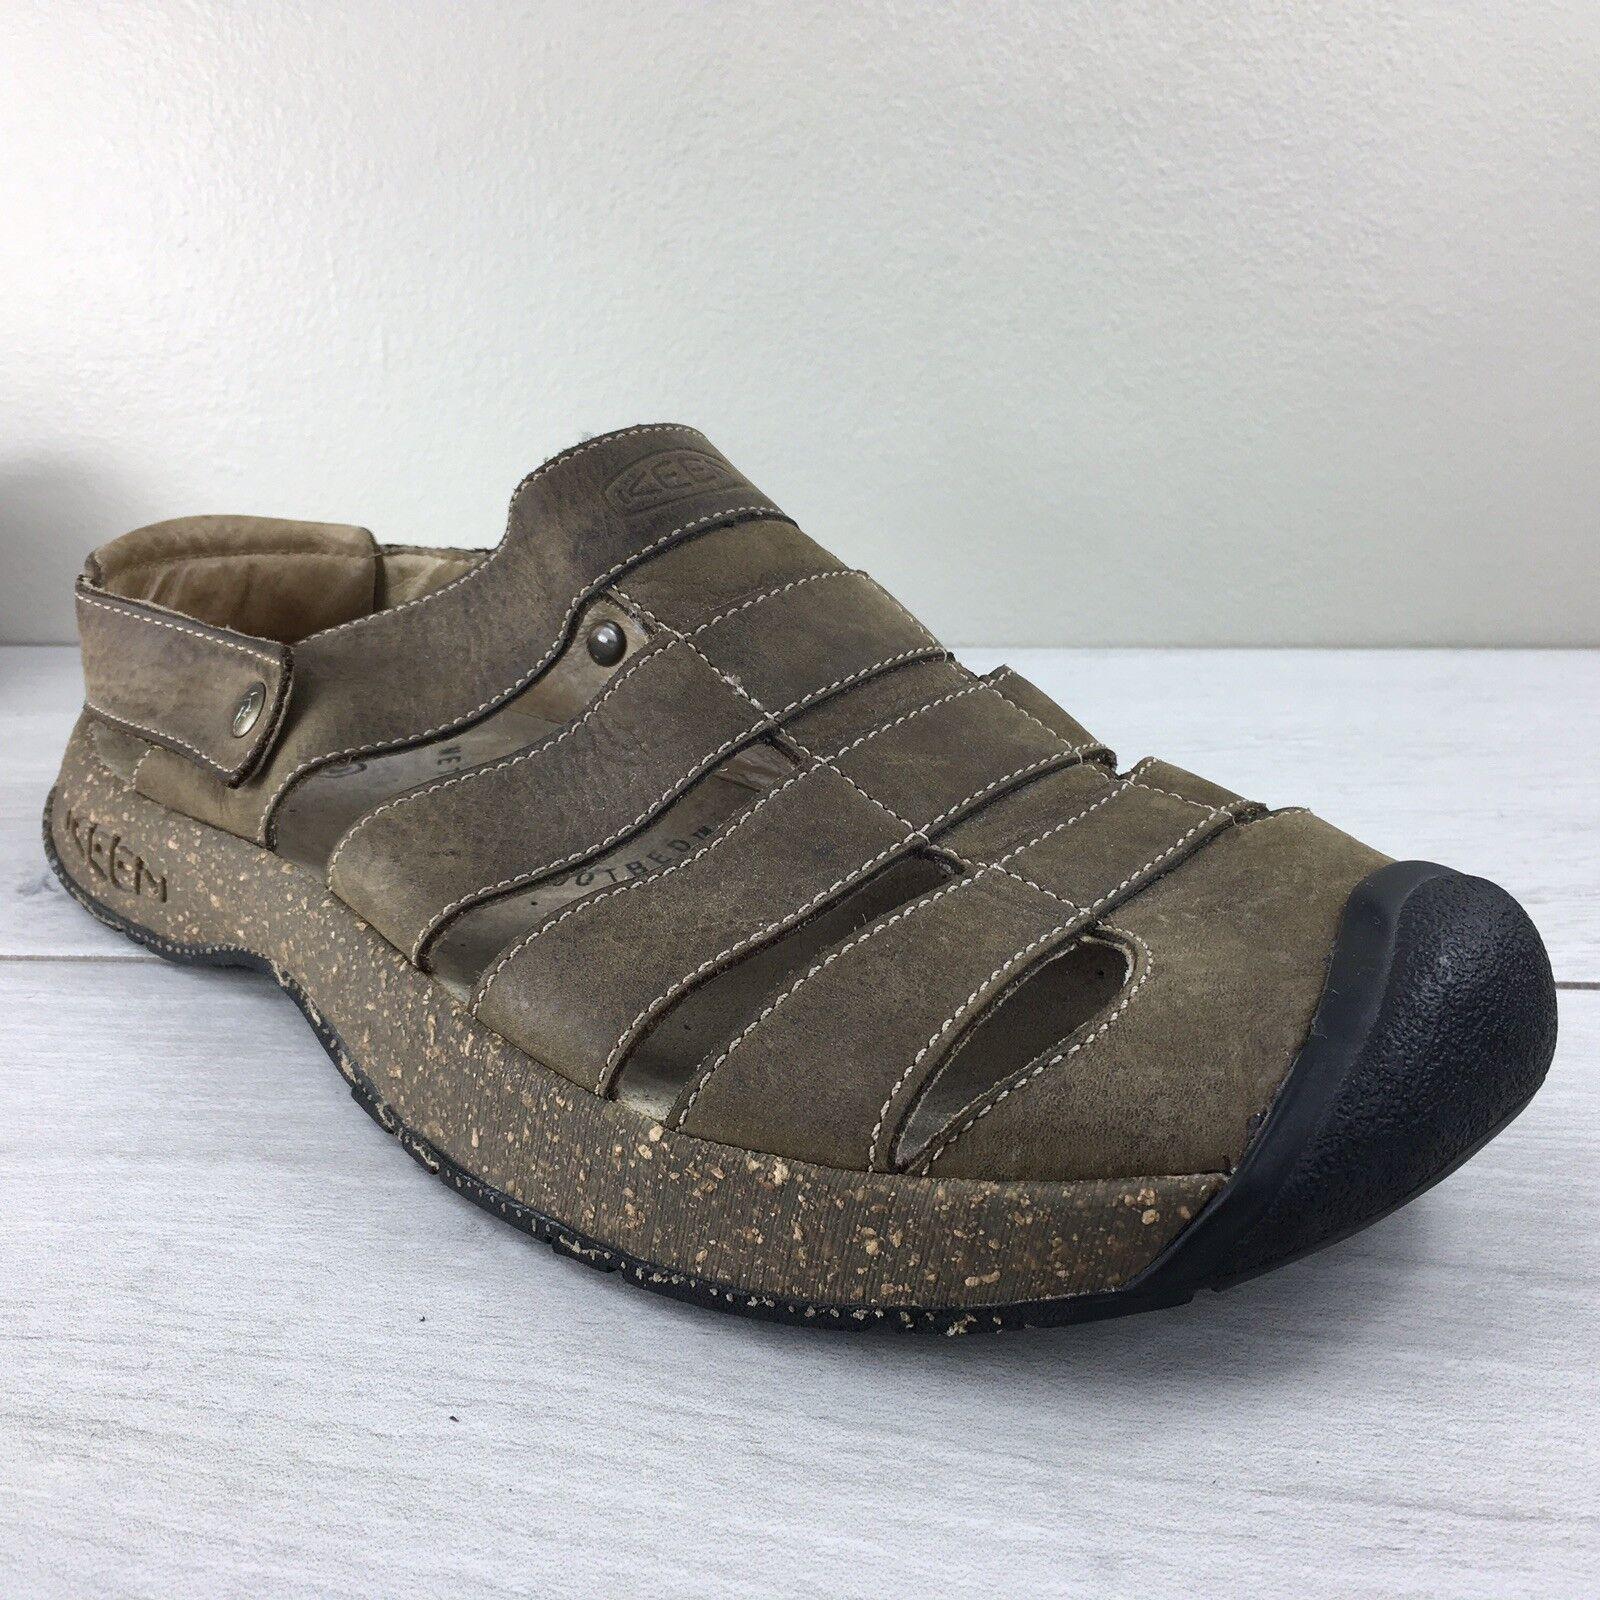 Mens Brown Leather Keen Hiking Camp Sandal Size 10 Camp Hiking Walking Comfort Casual 33eeca